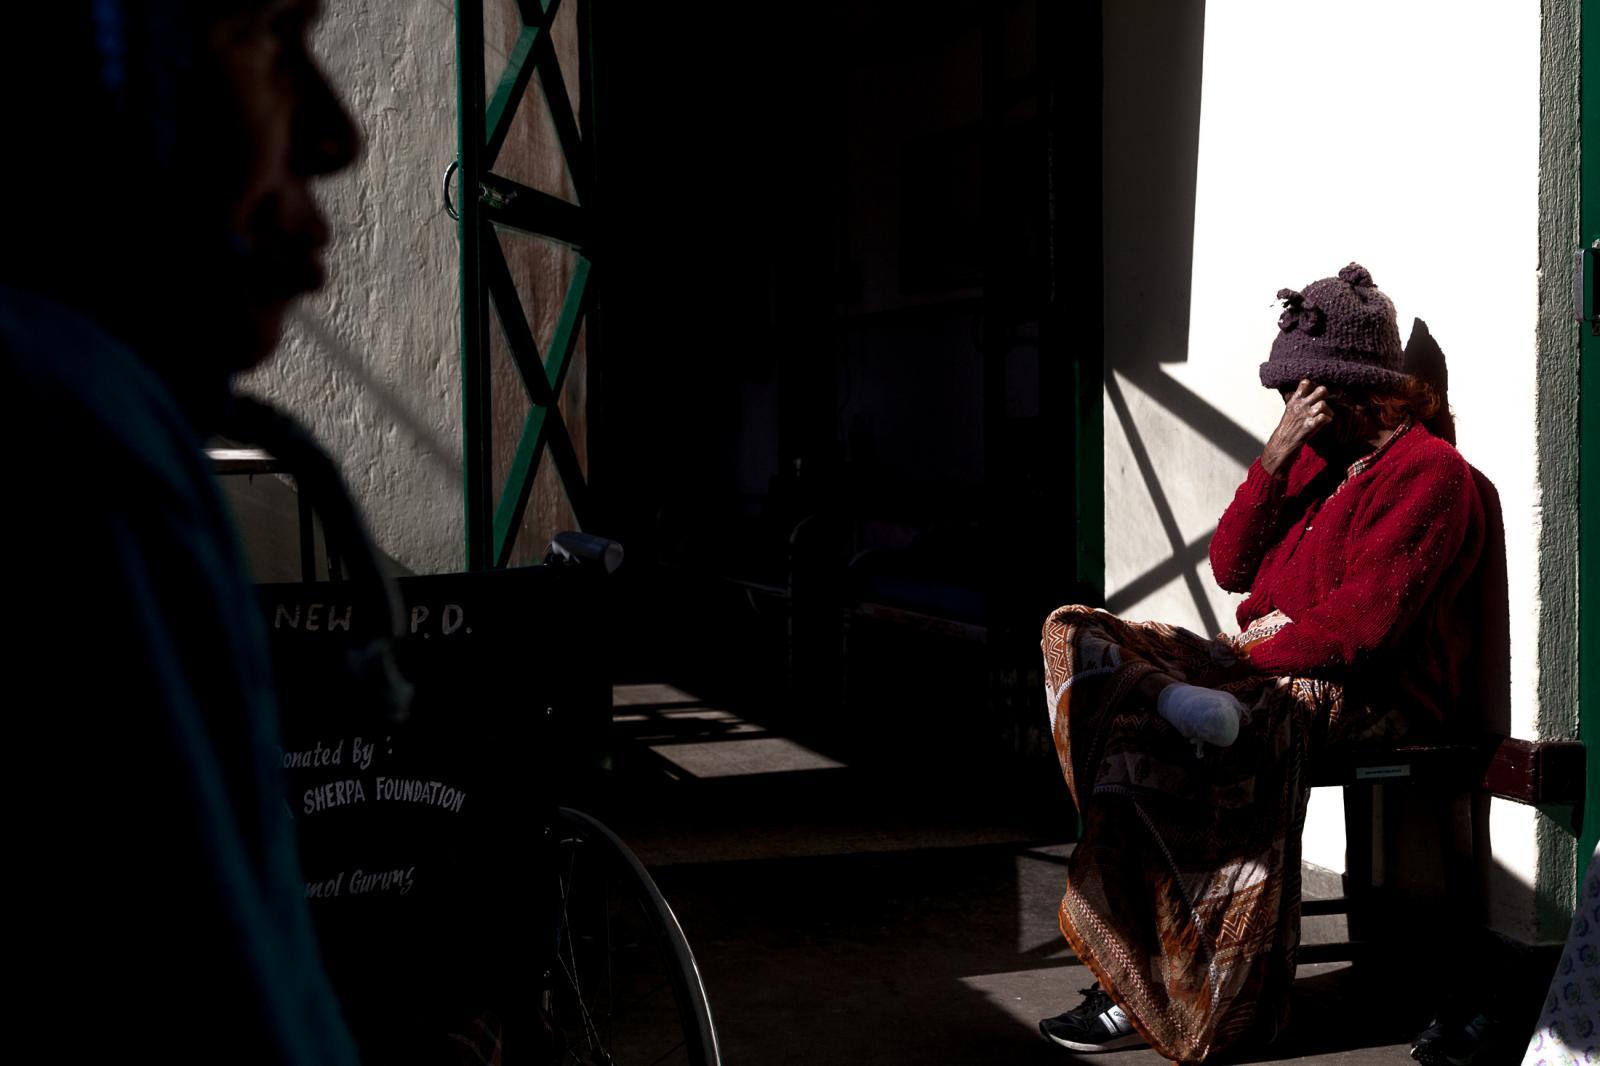 Photography image - Loading 002_Leprosy-Nepal-Omar-Havana.jpg